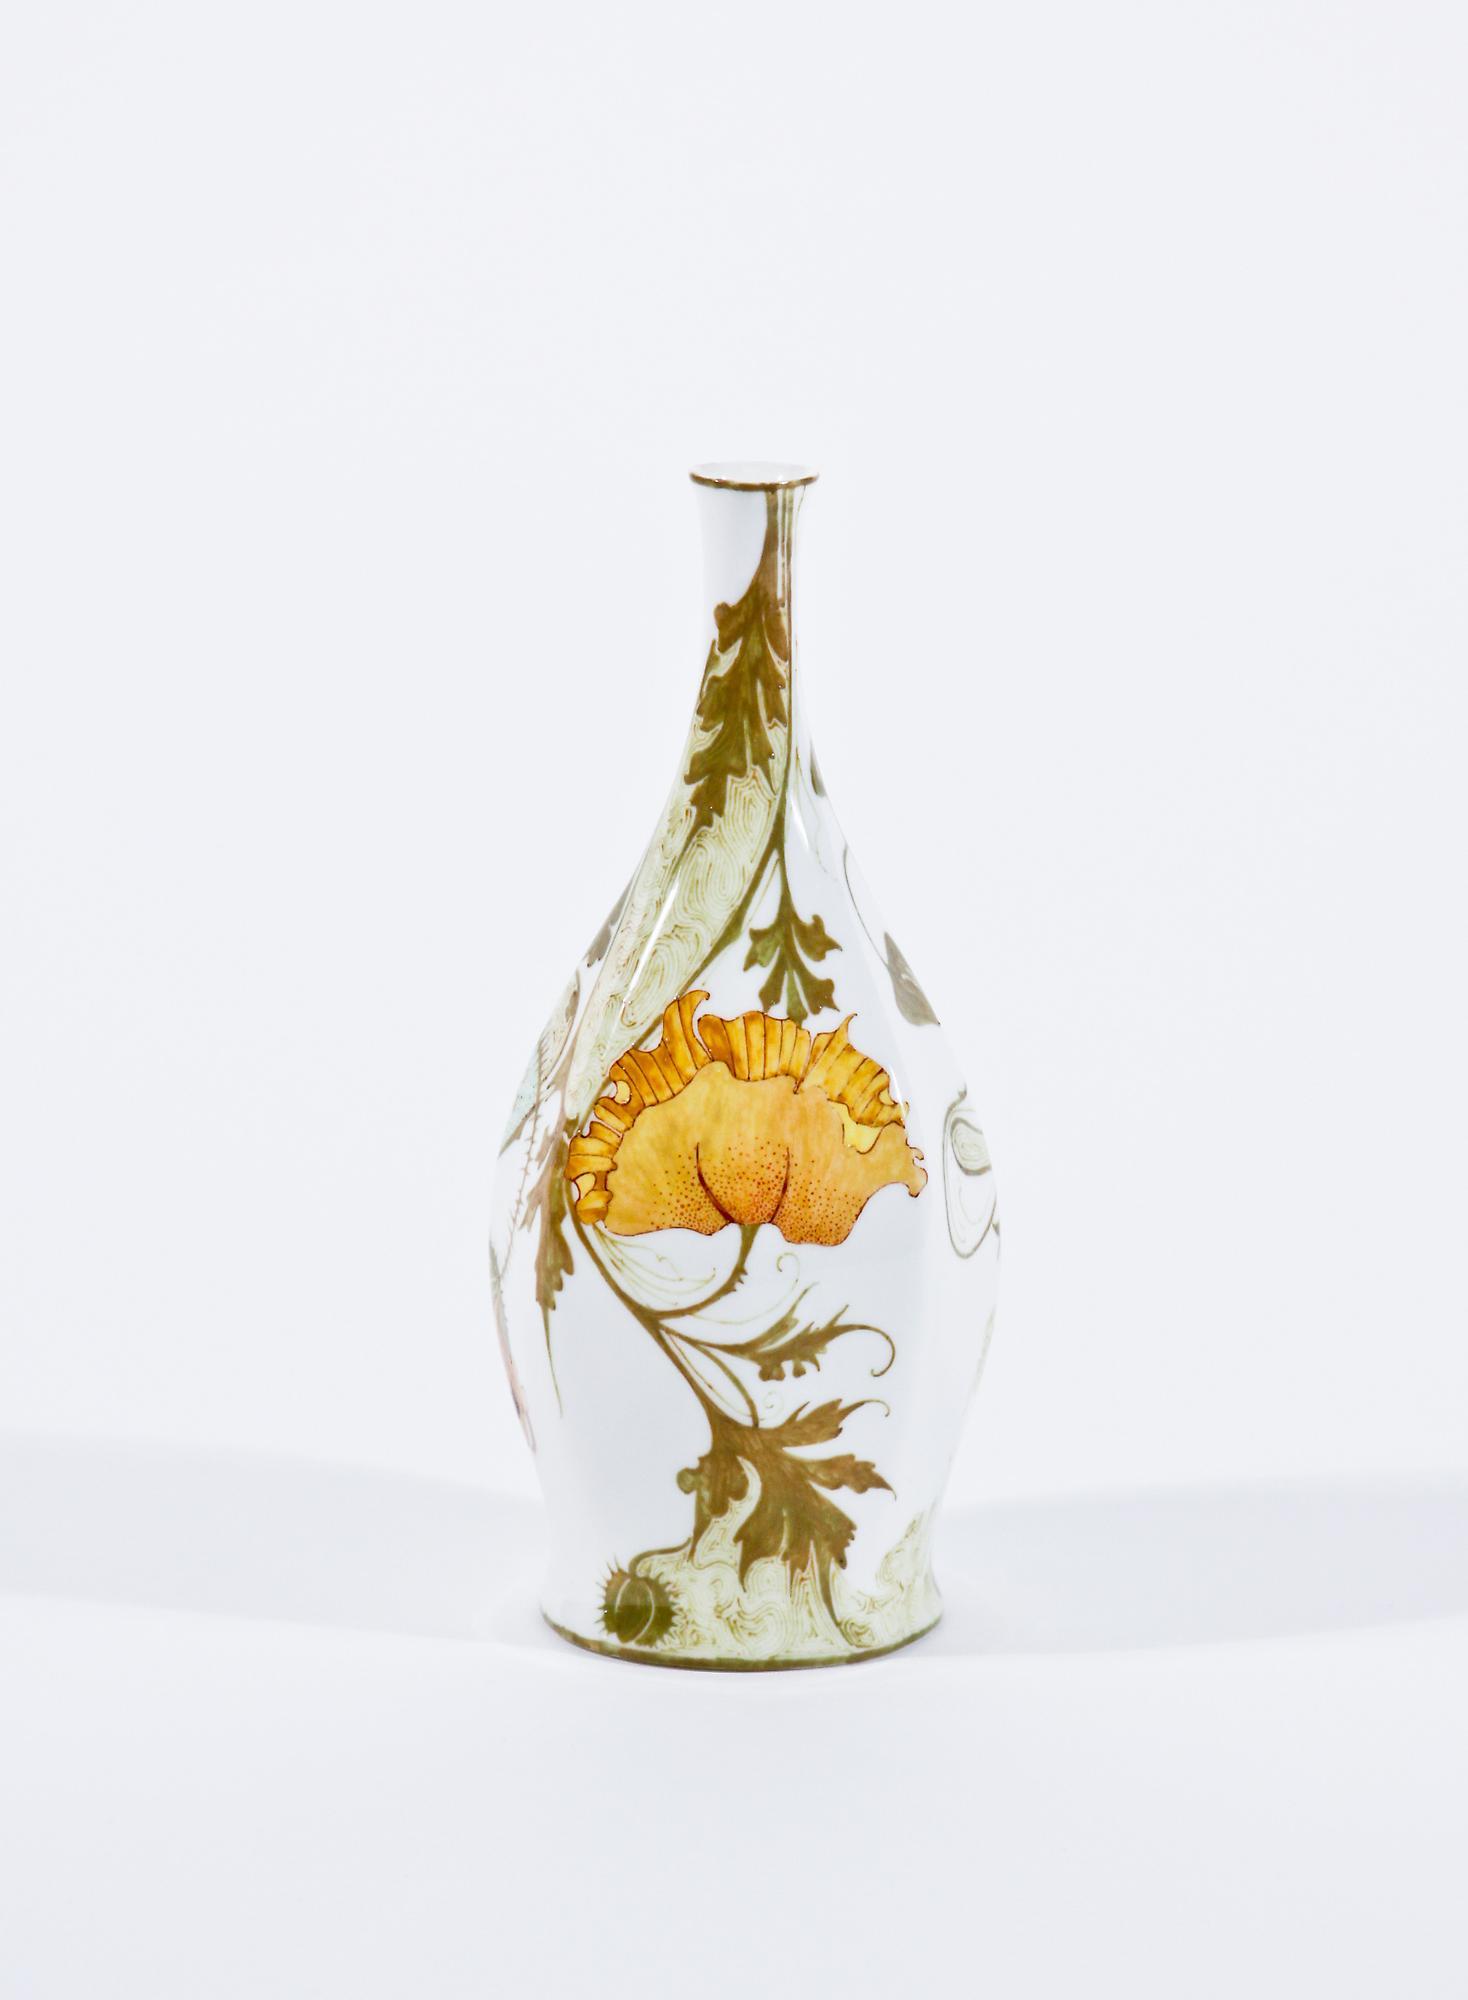 Rozenburg den Haag  Porcelain Vase 3